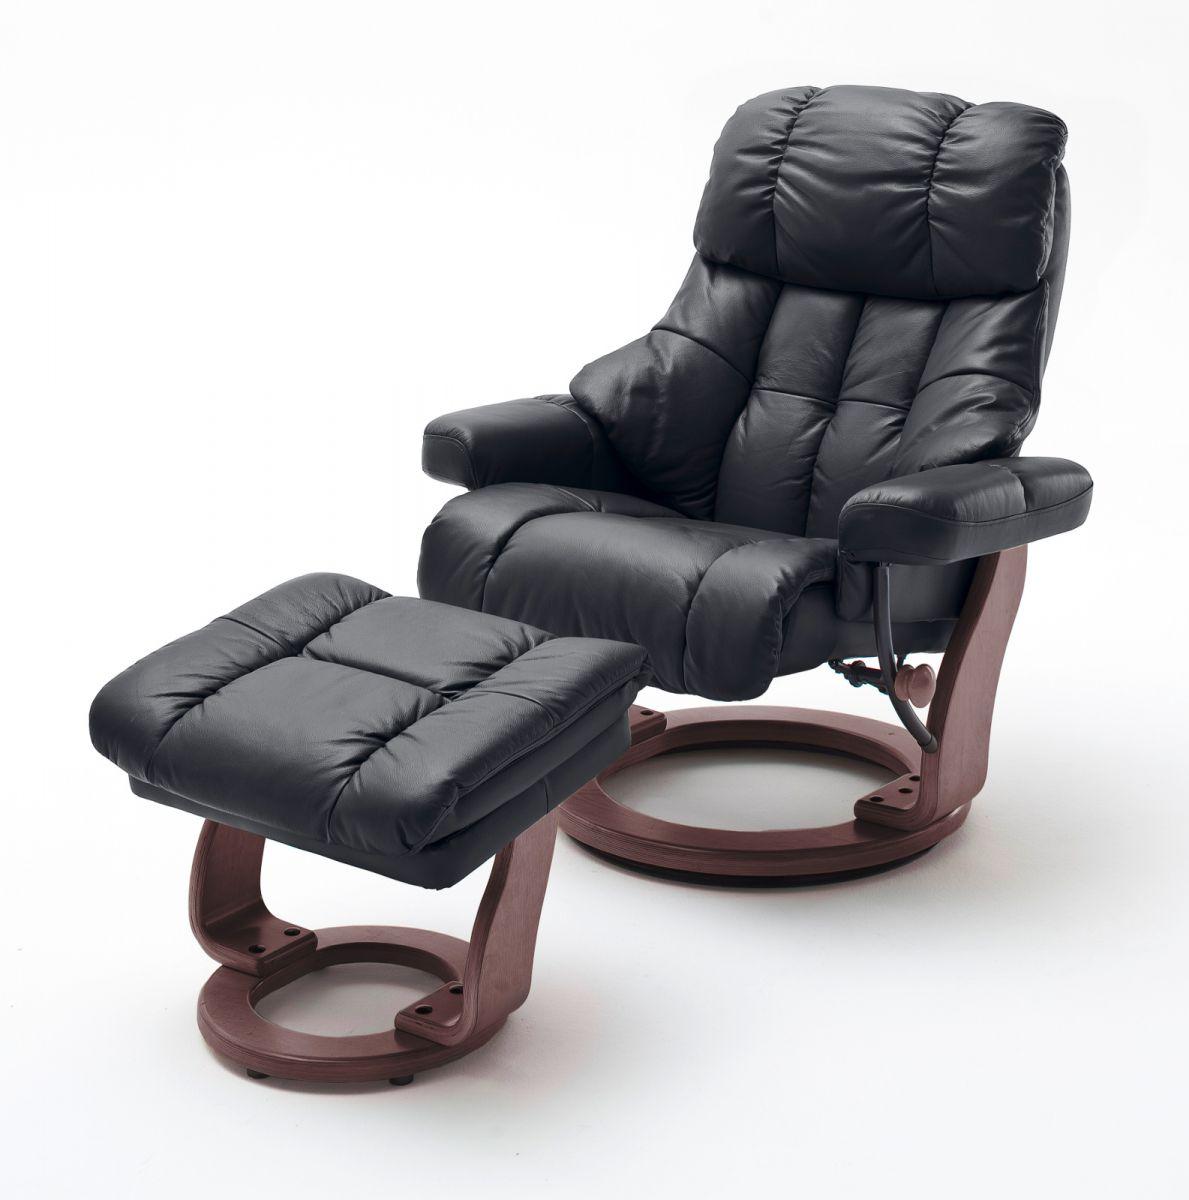 Relaxsessel Calgary XXL schwarz Leder mit Hocker